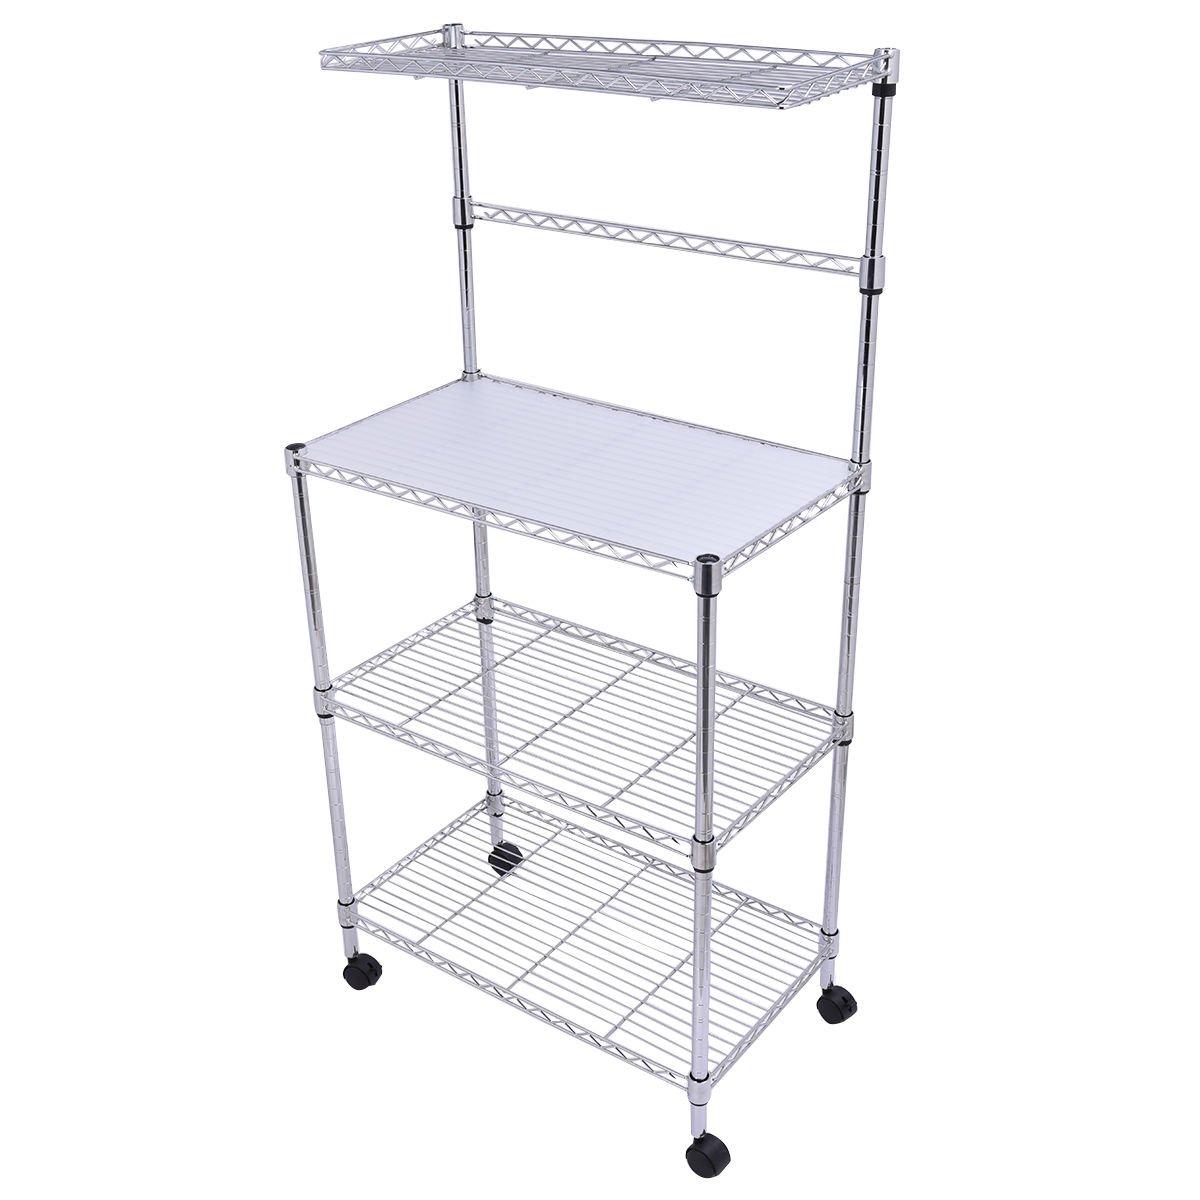 Amazon.com: 3 Tier Kitchen Bakeru0027s Rack Microwave Oven Stand Storage Cart  Workstation Shelf: Home U0026 Kitchen